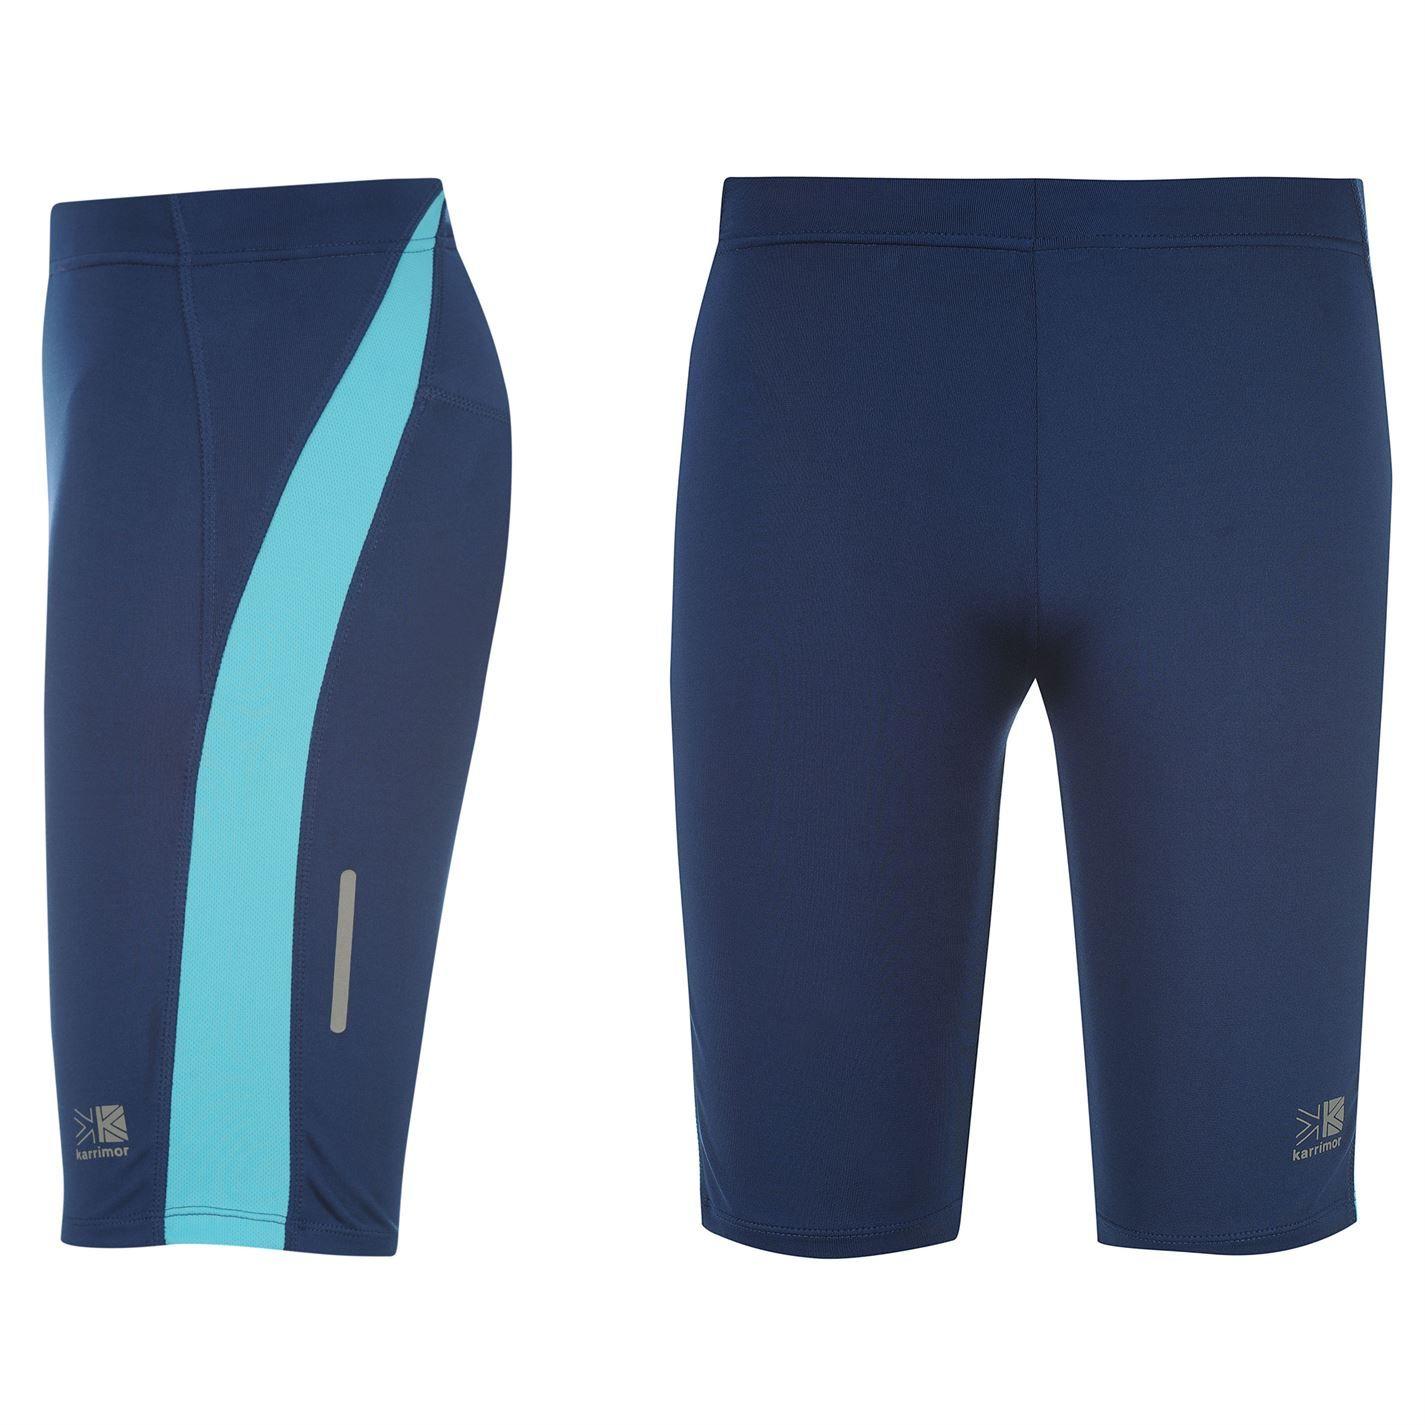 Karrimor Short Running Tights Ladies >> Now £4.99